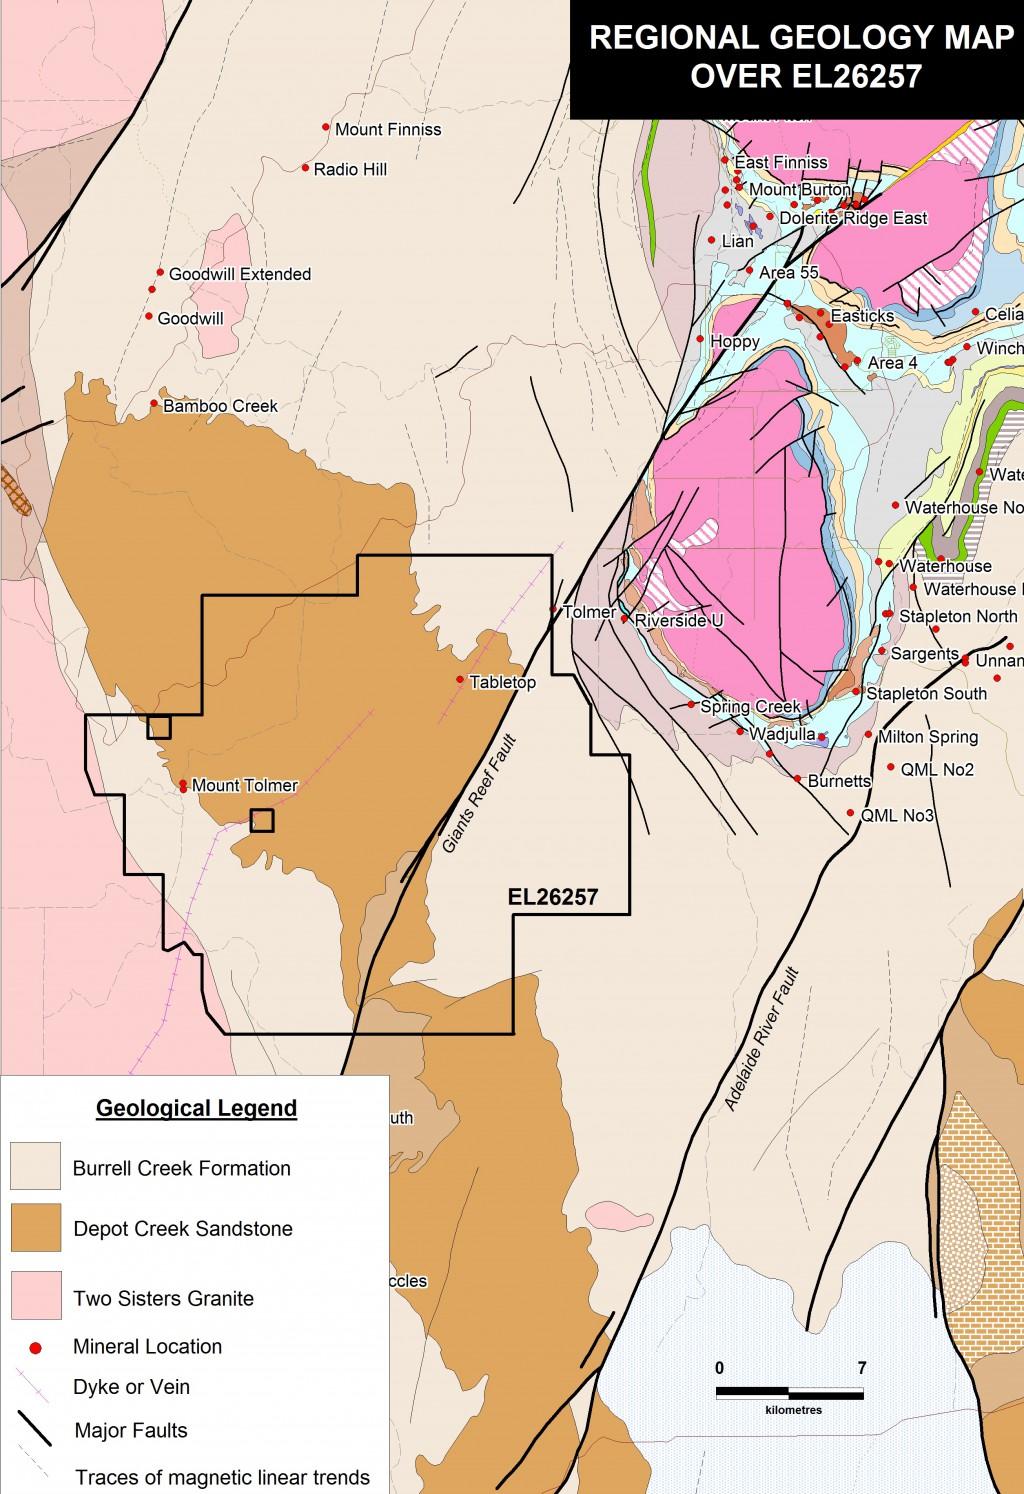 West Bachelor Regional Geology Map over EL26257.jpg